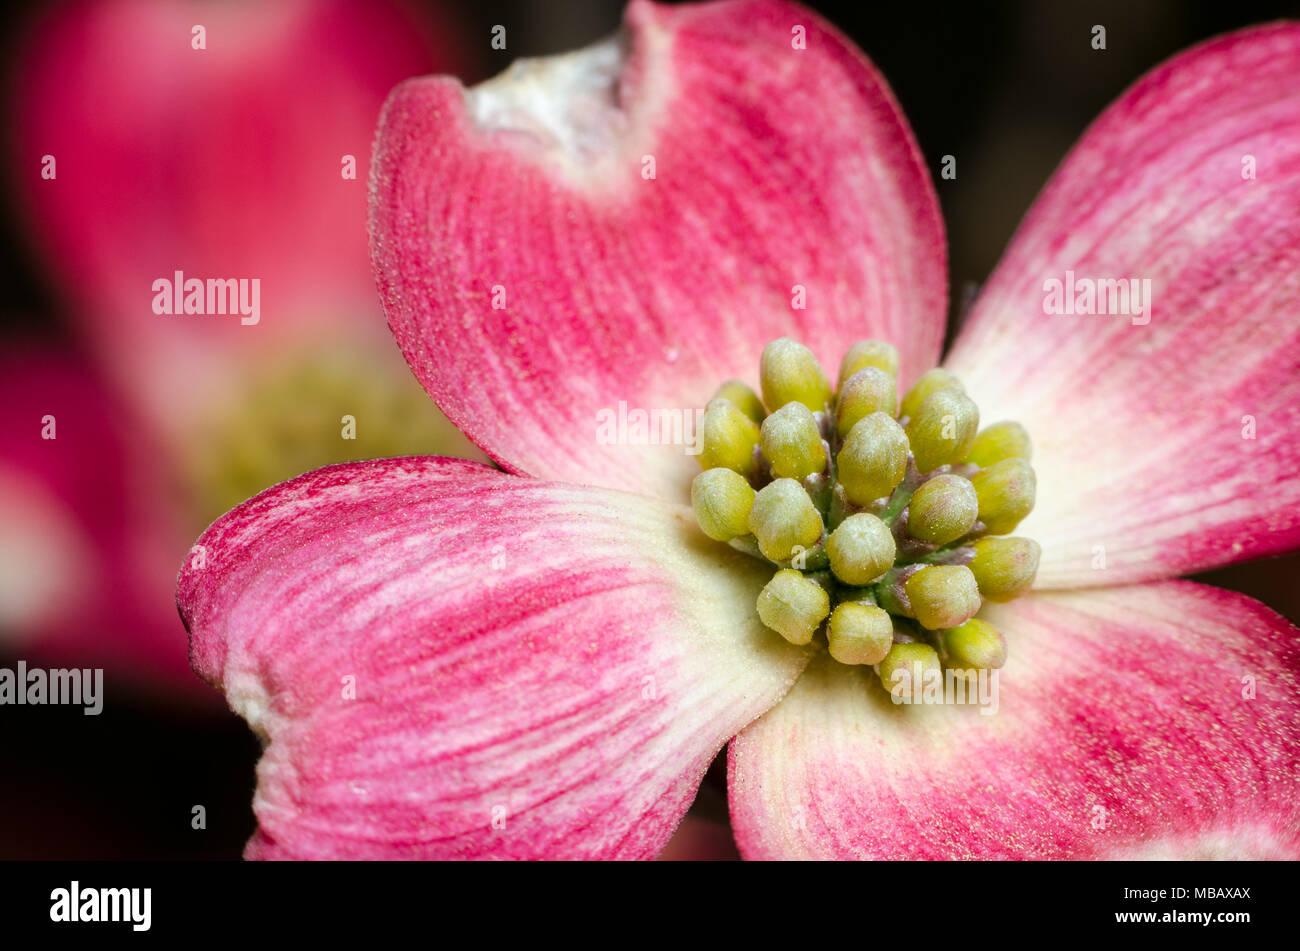 Pink Flowering Dogwood Flower Close Up Stock Photo 179105106 Alamy